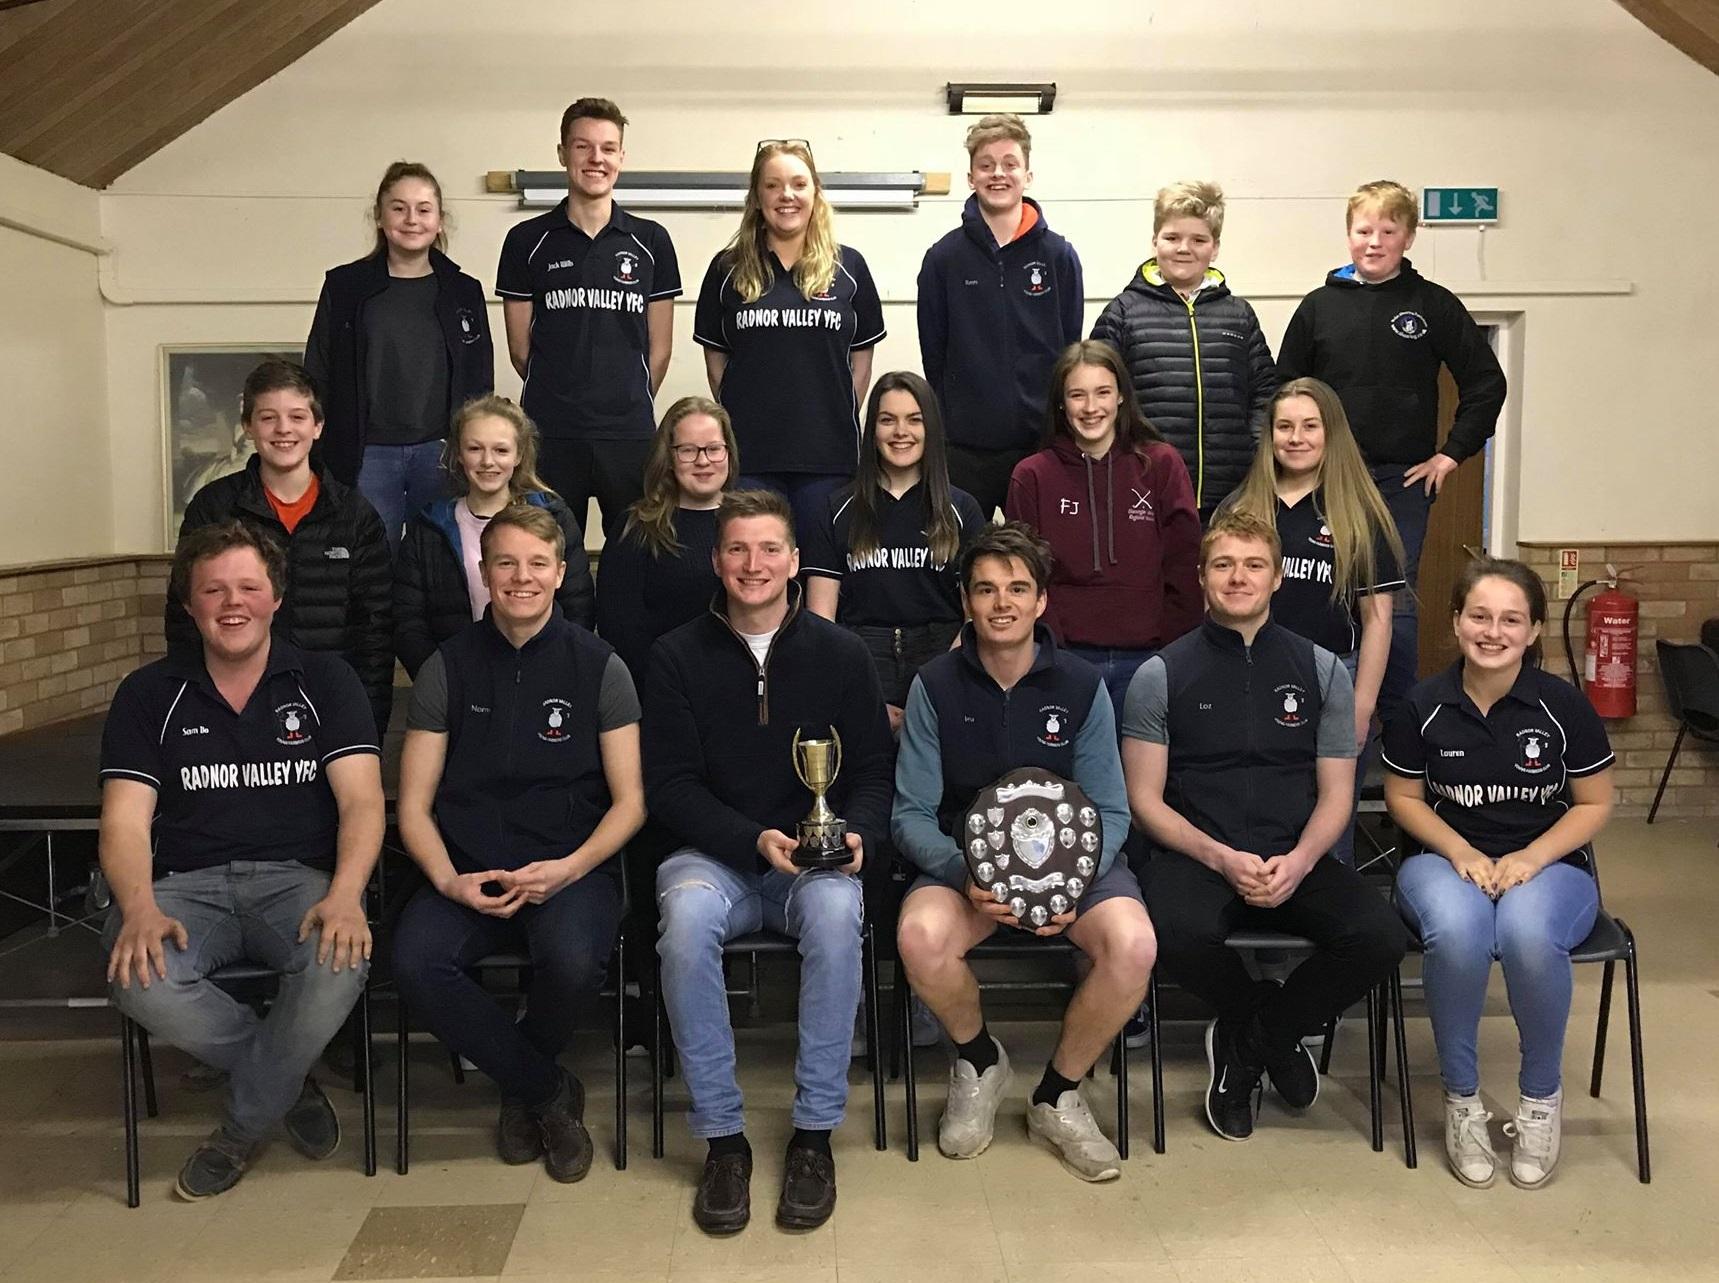 Last year's Field Day winners, Radnor Valley YFC.